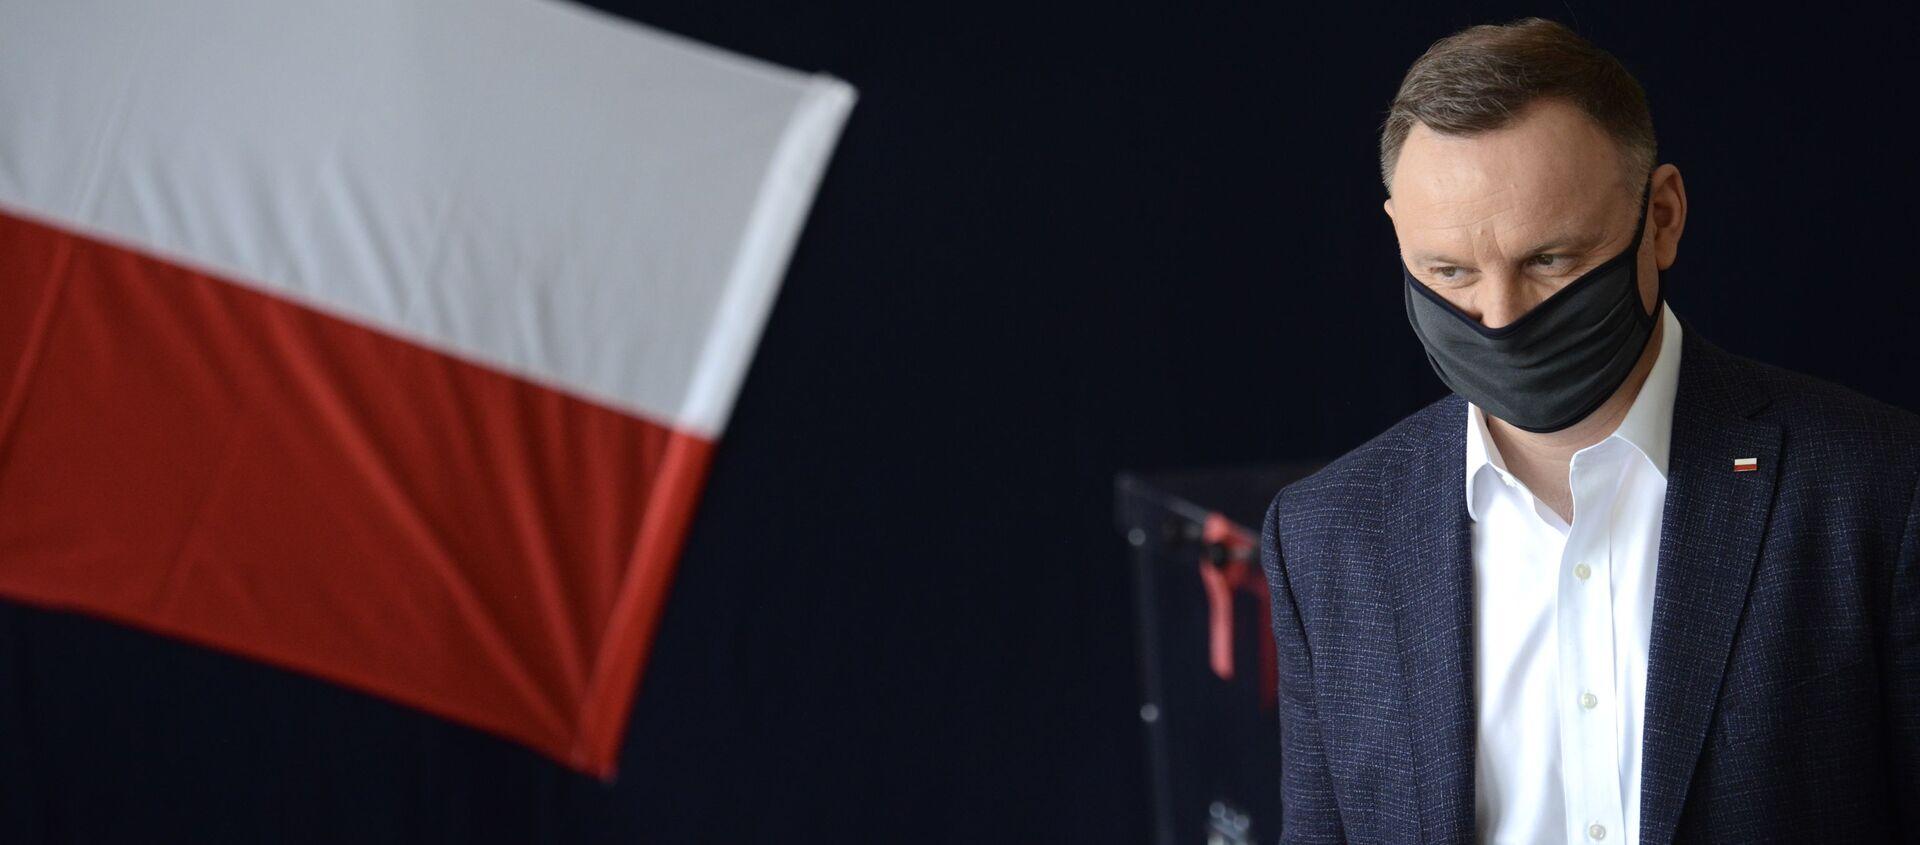 Prezydent RP Andrzej Duda - Sputnik Polska, 1920, 13.12.2020